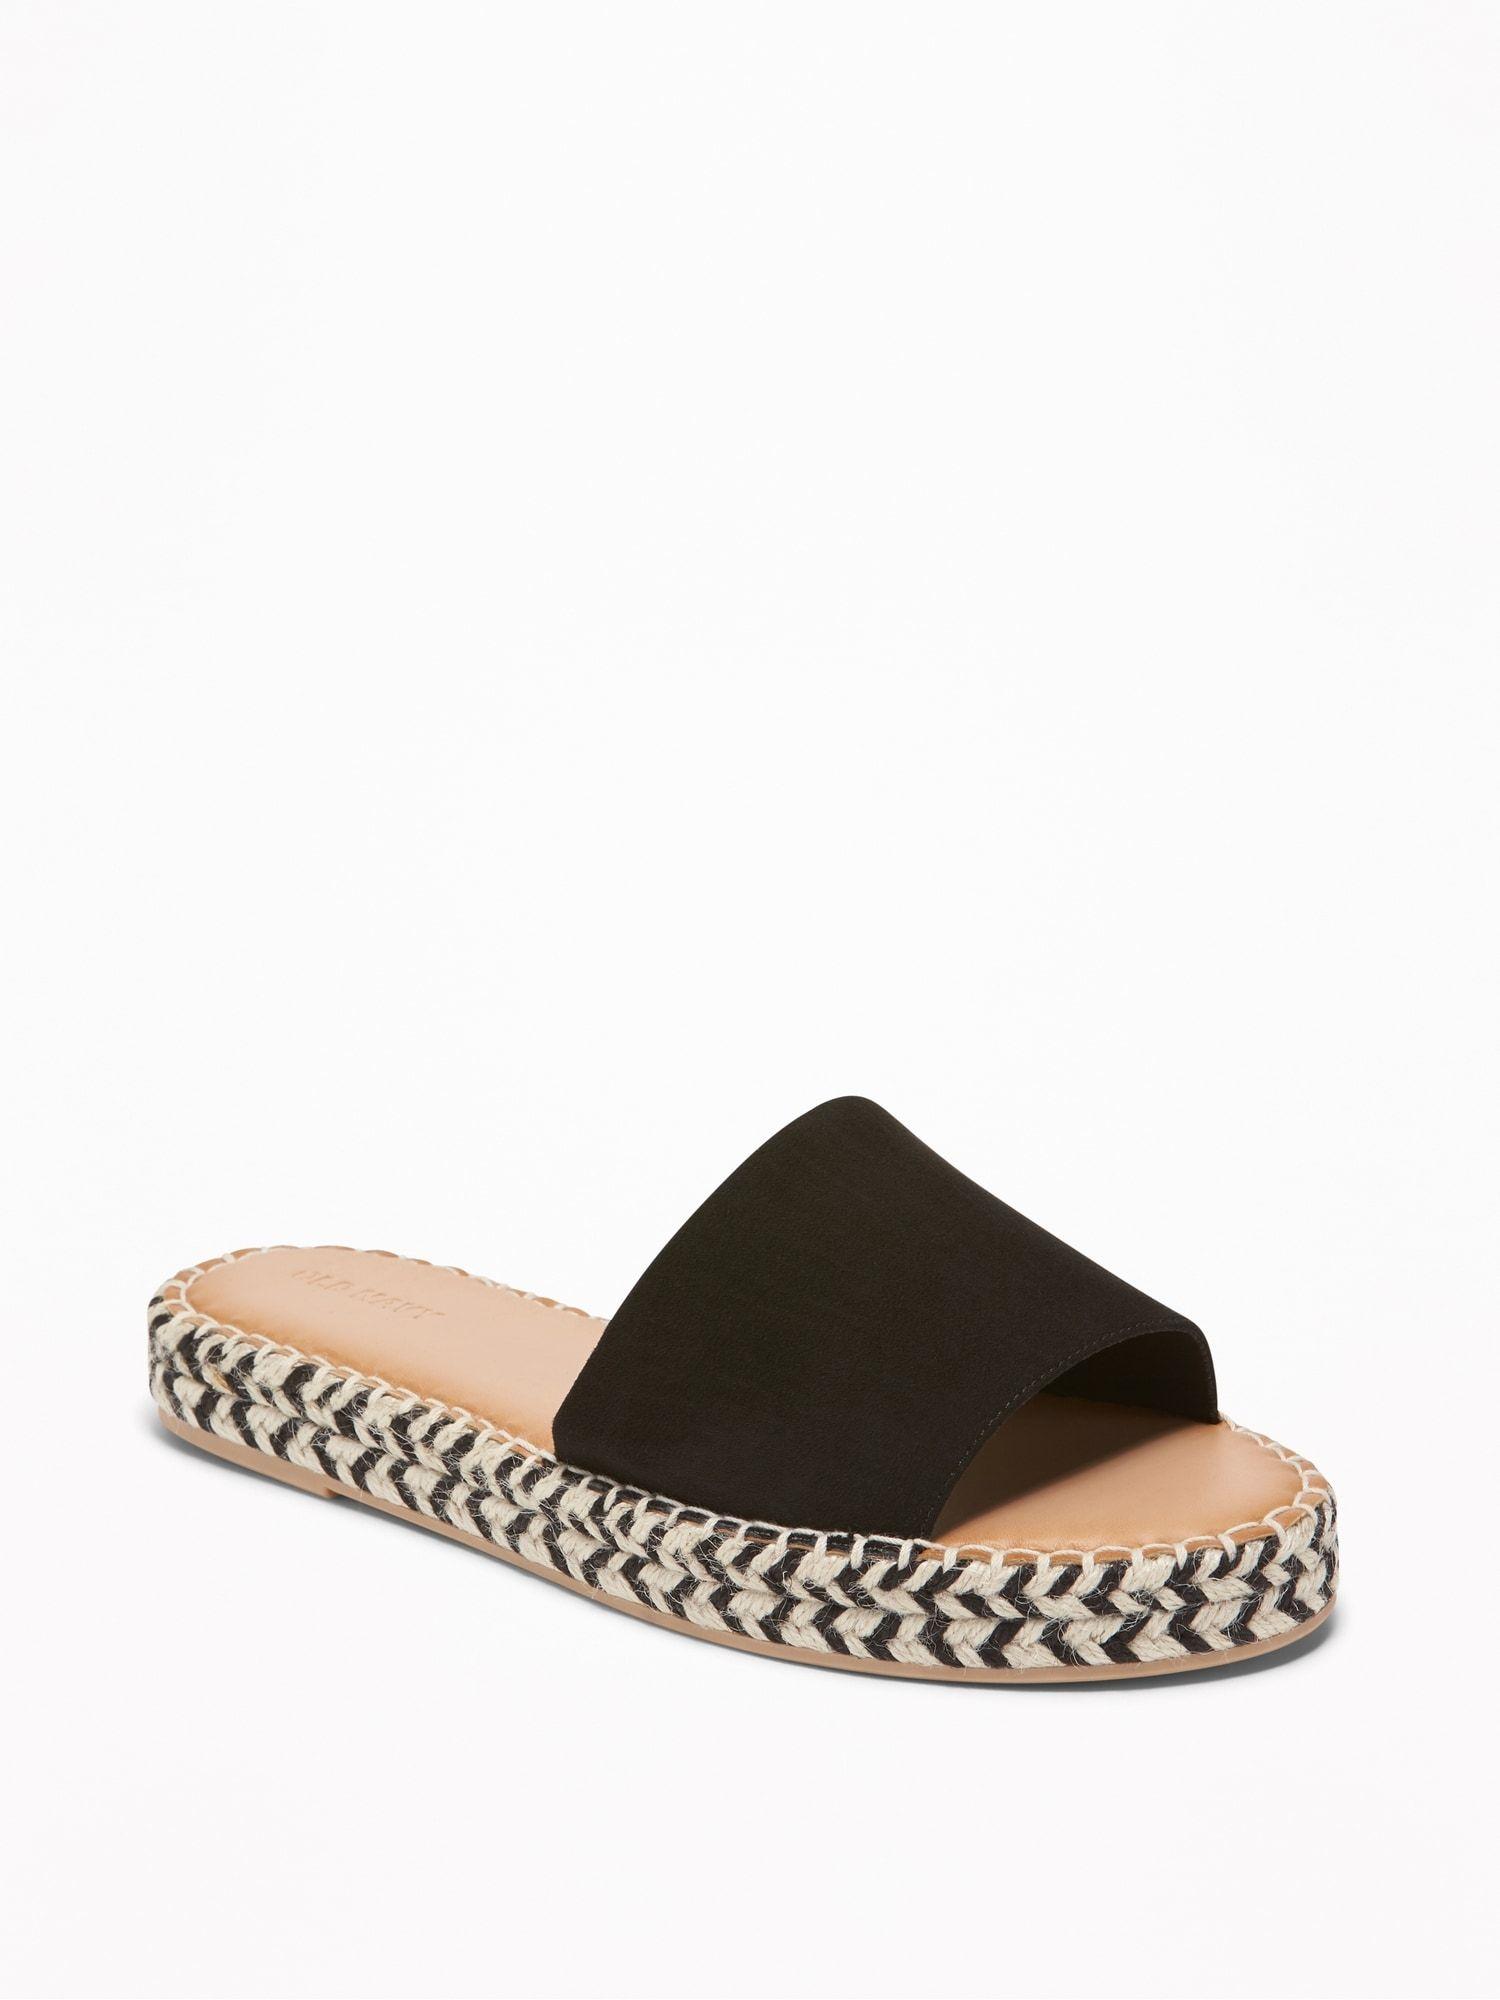 69e9ceeb750 Faux-Suede Slide Espadrille Sandals for Women in 2019 | (( adorn ...